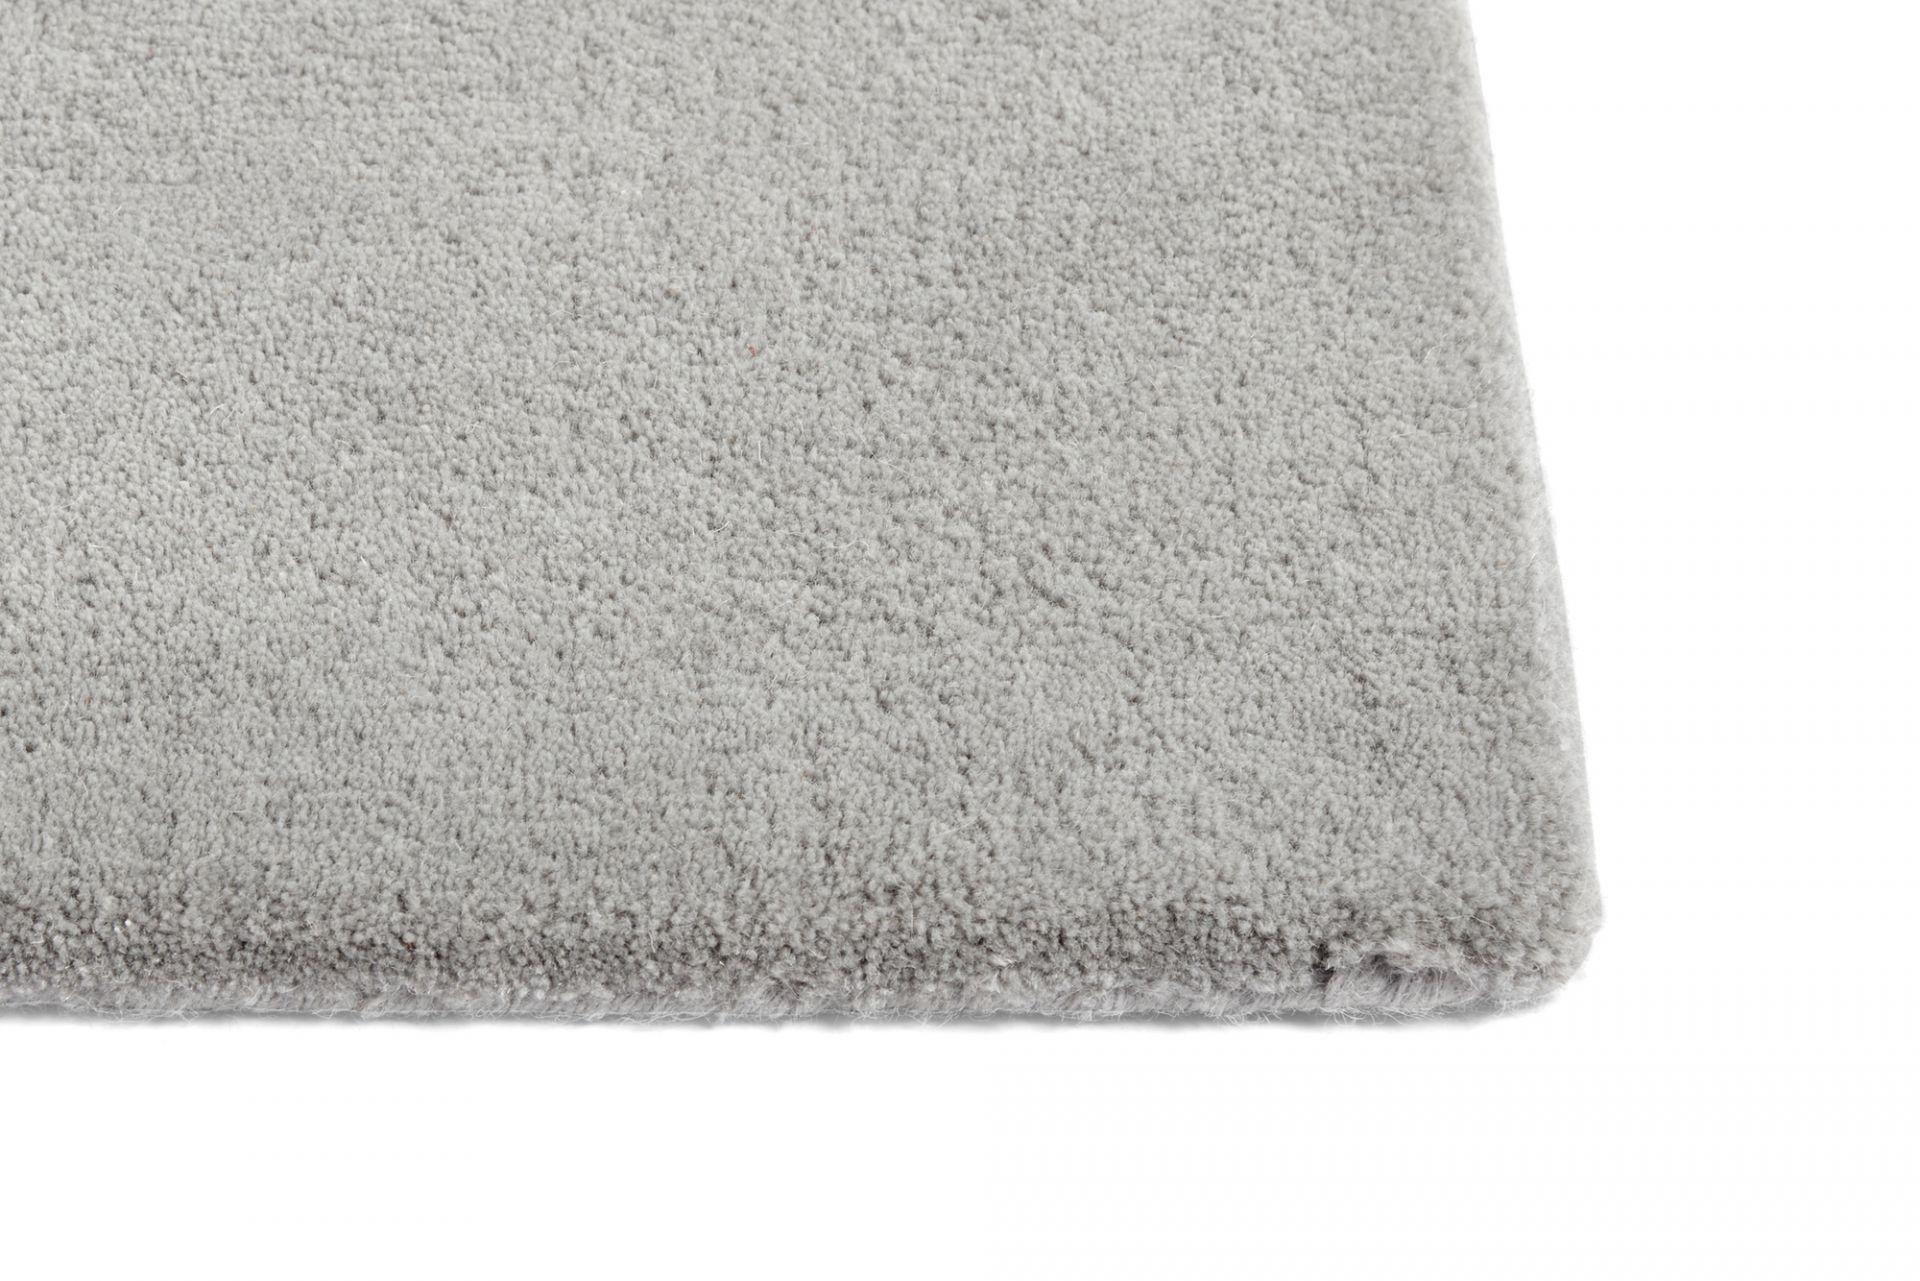 Raw Rug No 2 Carpet L 240 cm light grey Hay